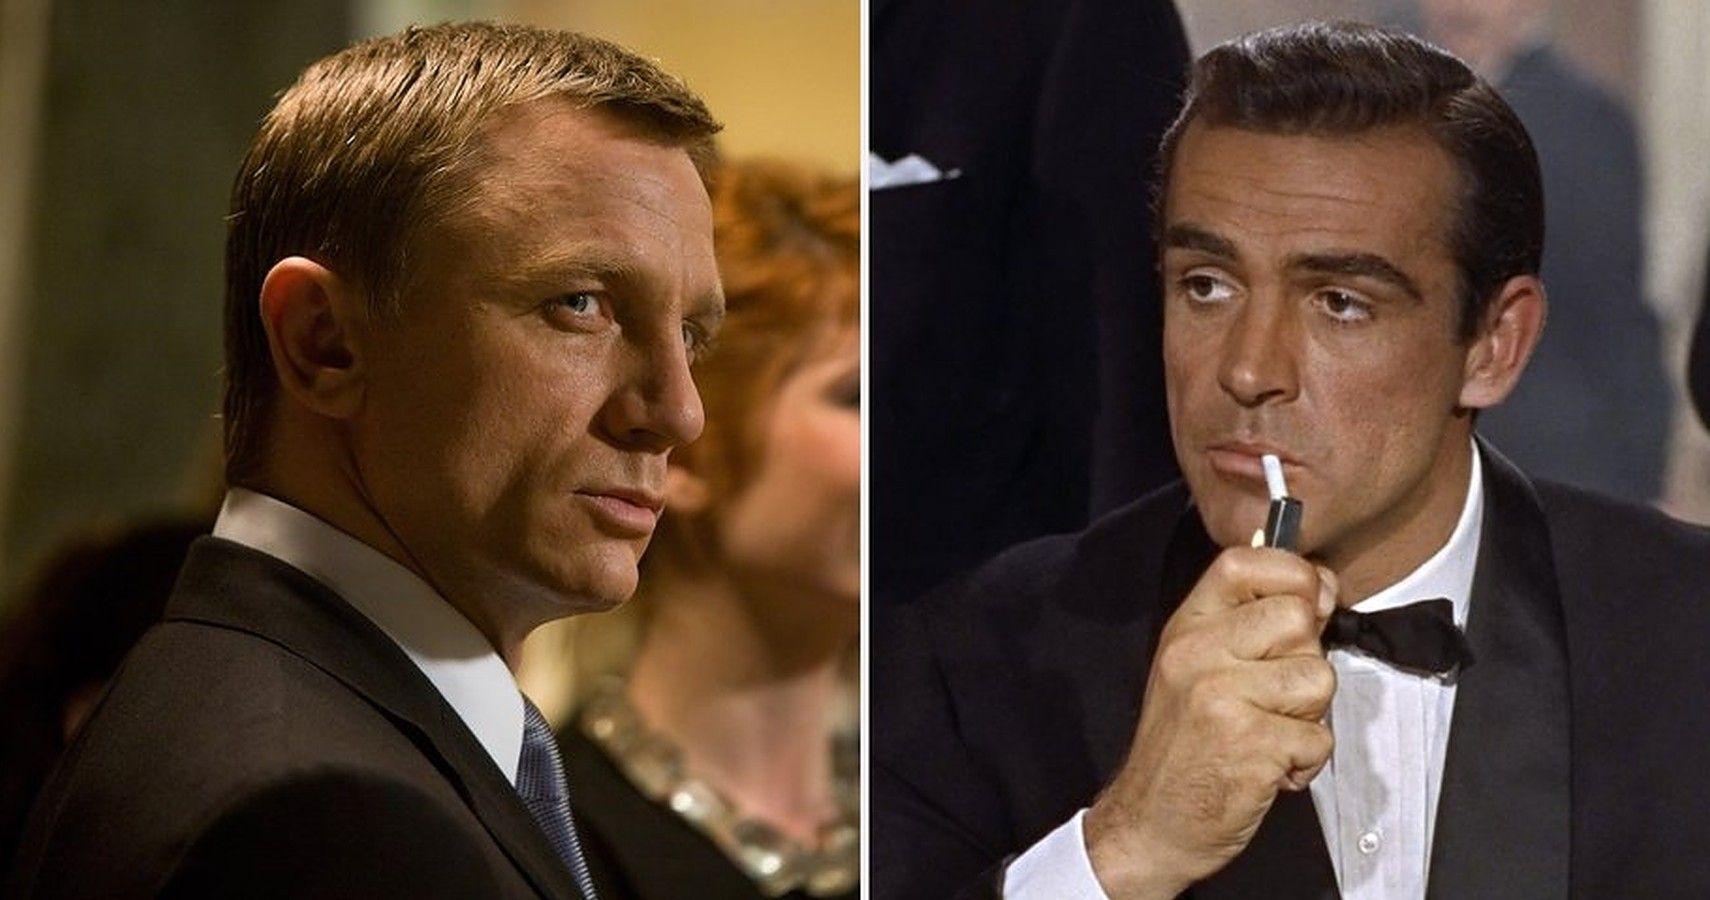 10 Best James Bond Movies According To Imdb Screenrant